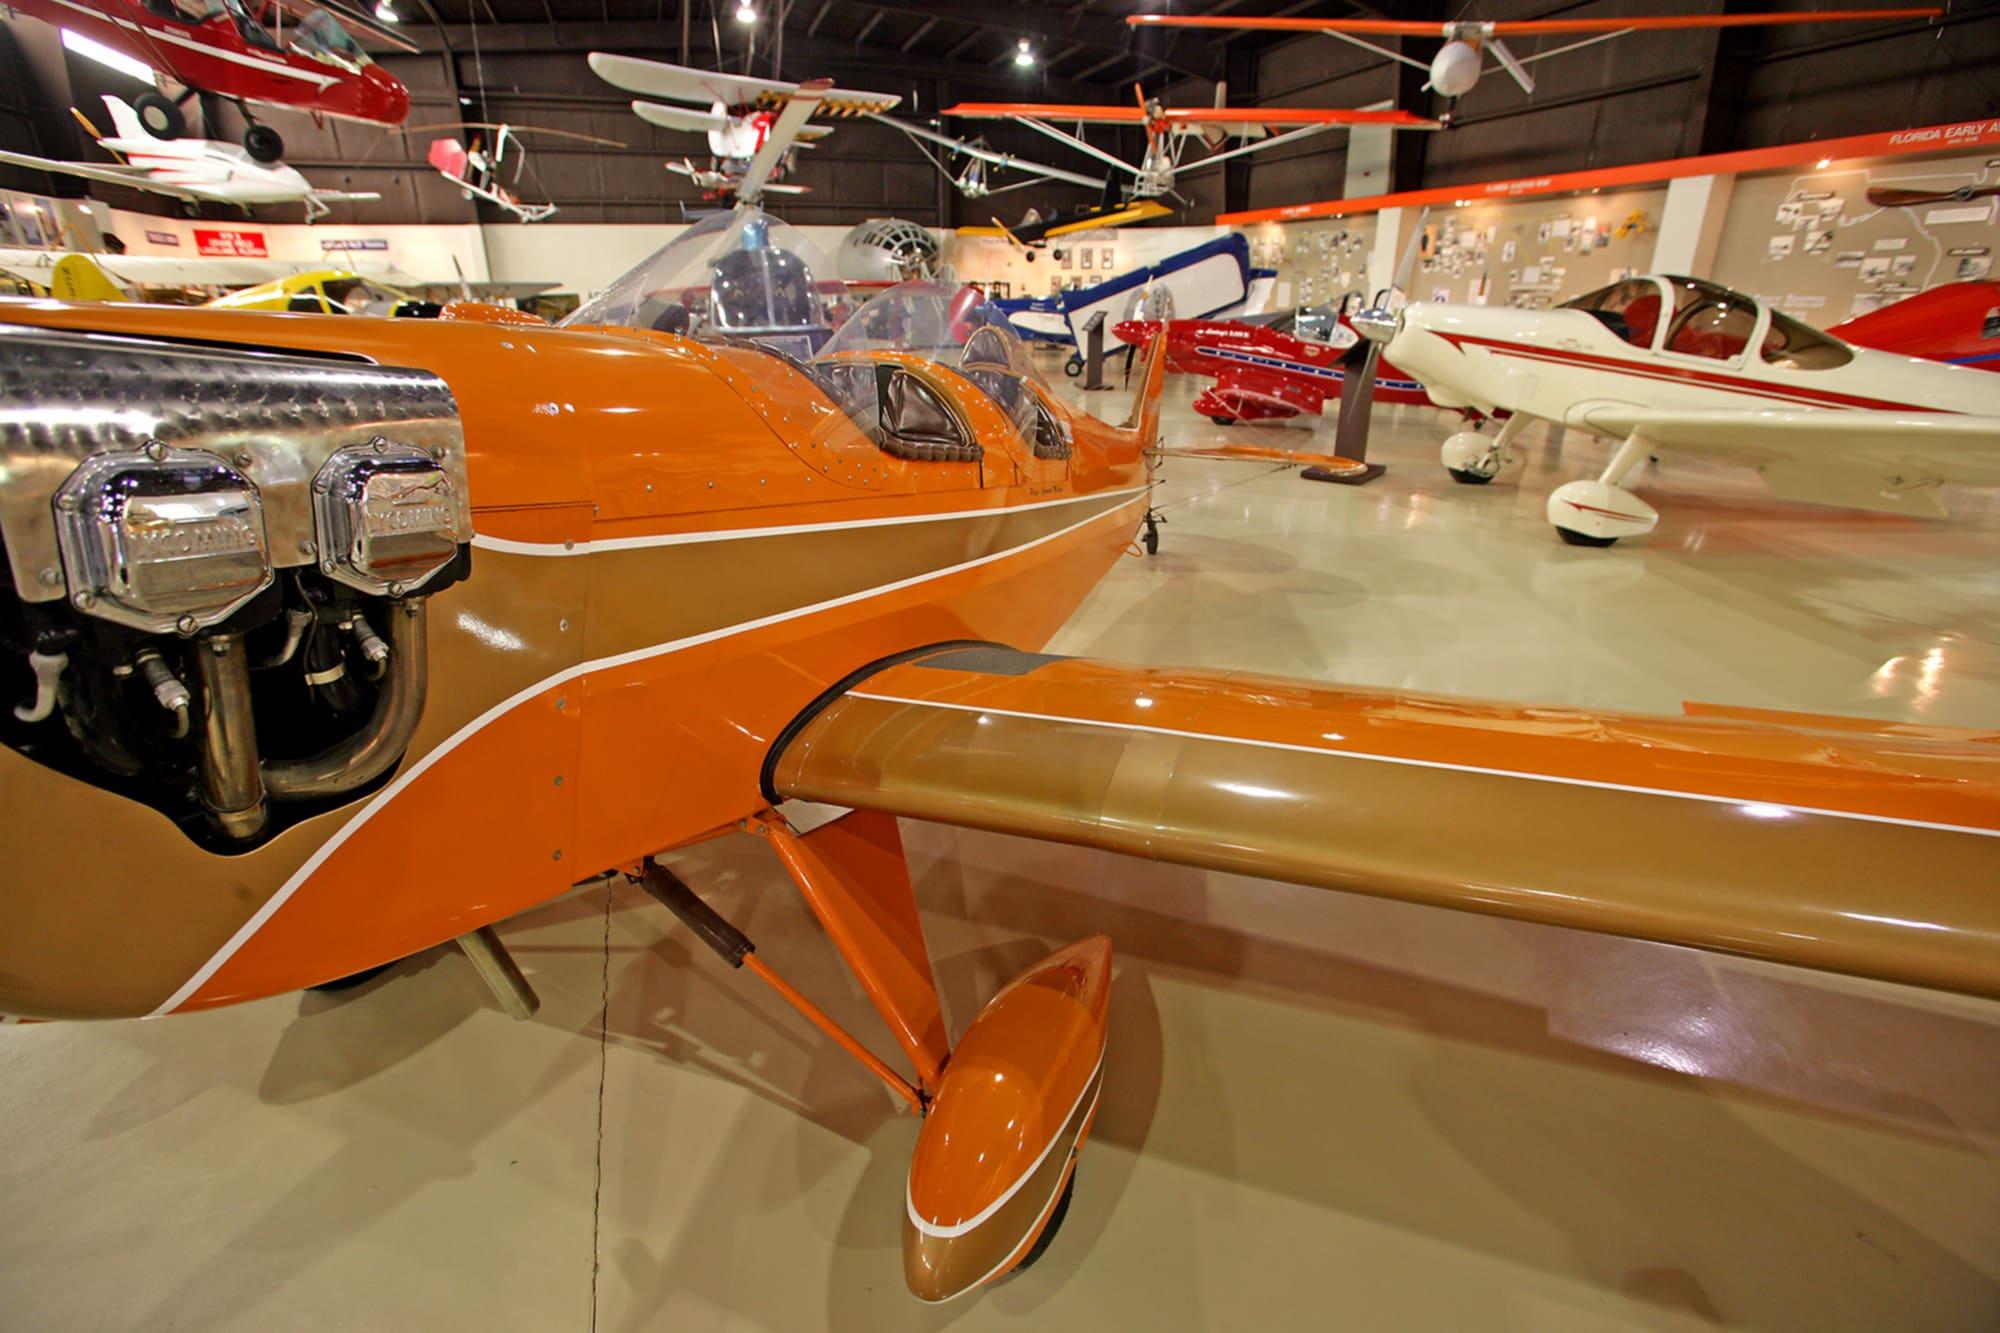 Multiple airplanes on display at Florida Air Museum in Lakeland, FL